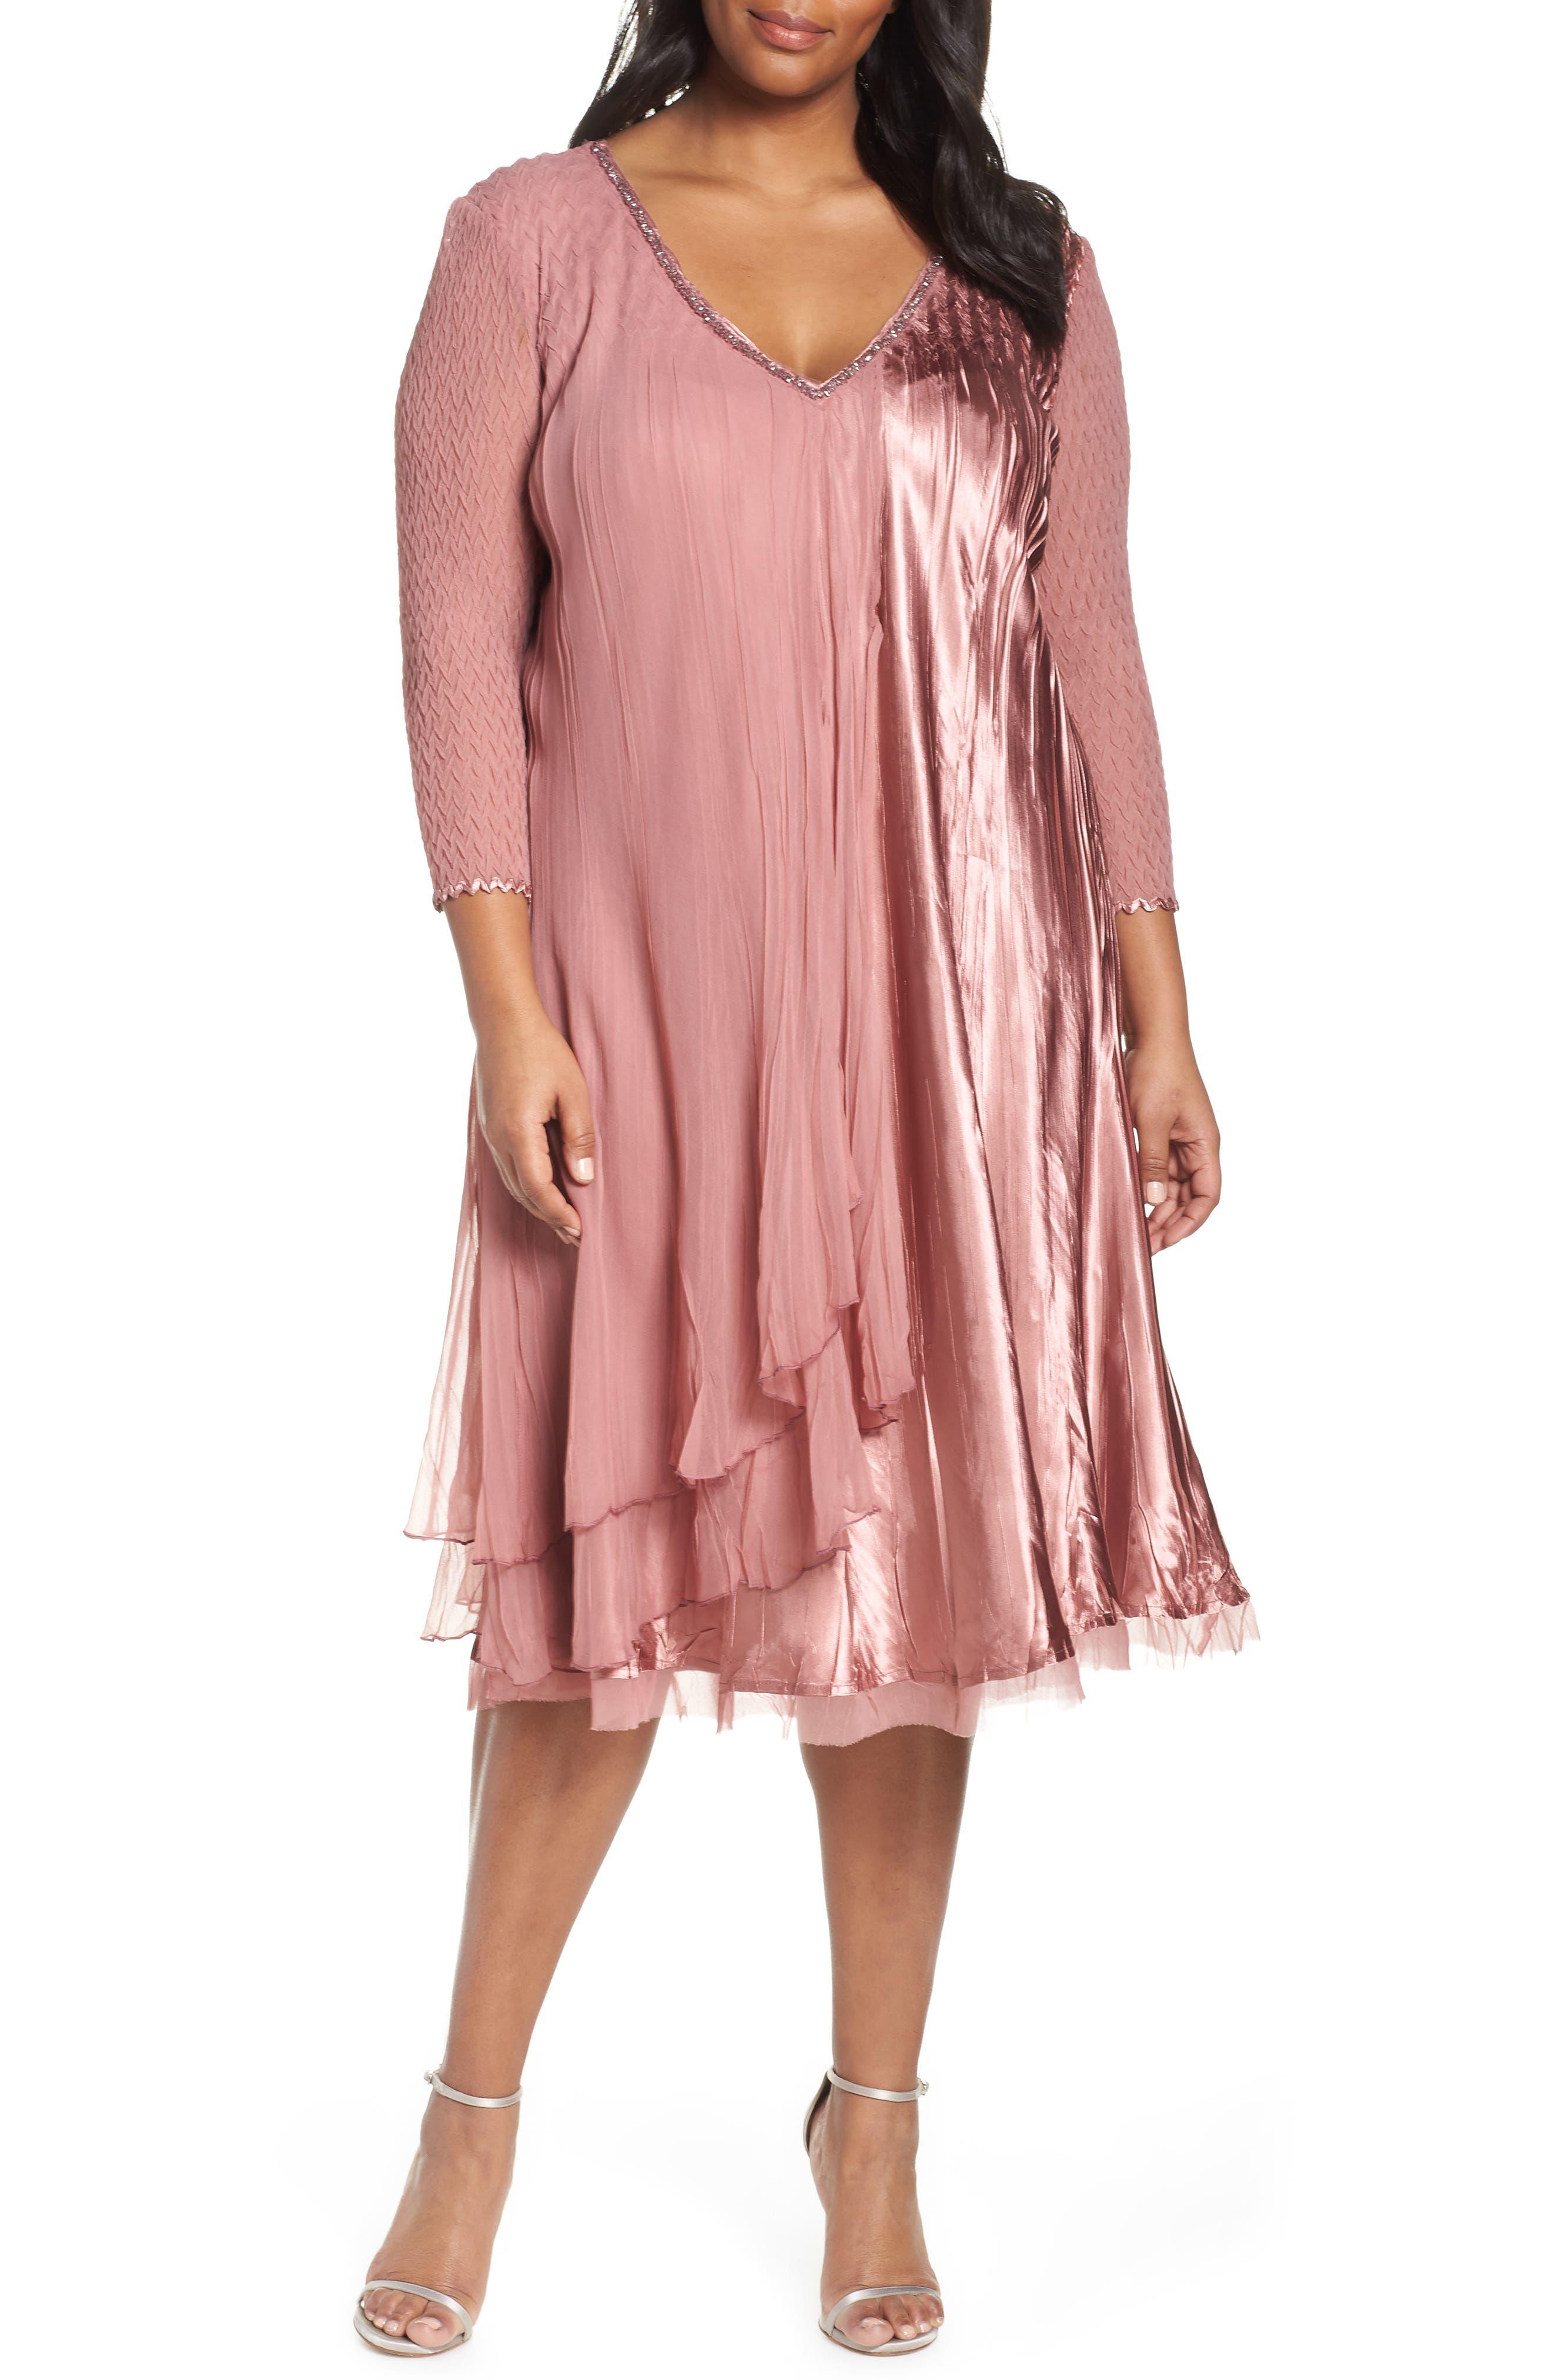 KOMAROV Tiered A-Line Dress, Main, color, 680